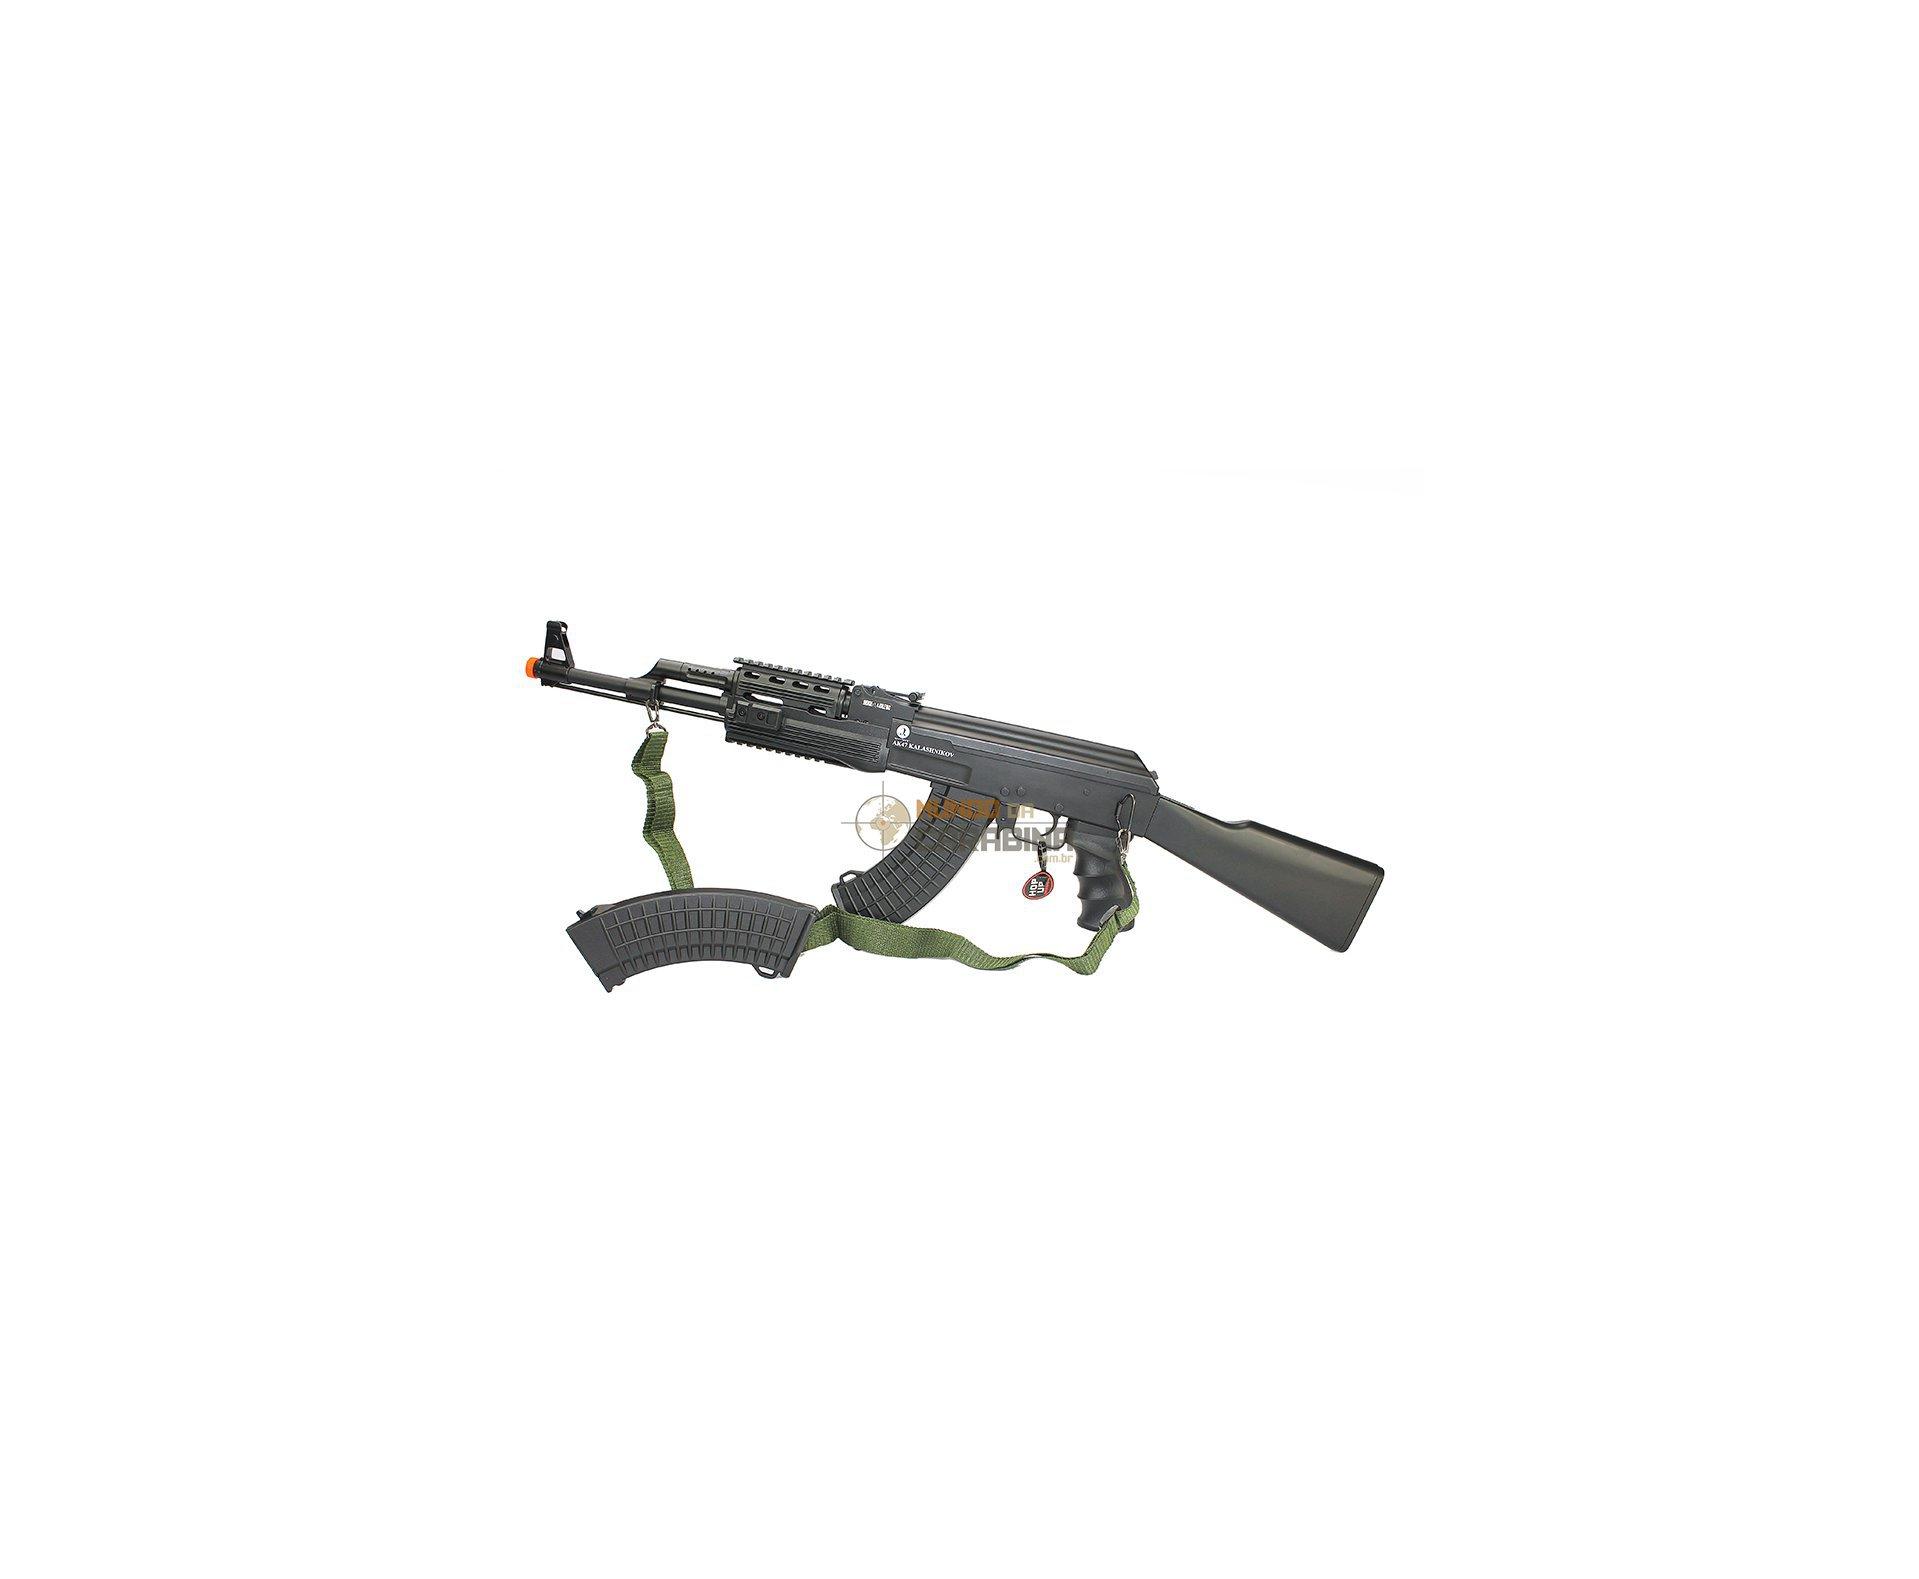 Rifle De Airsoft Ak 47 Tactical Fsv Full + Case Molle - Cal 6,0mm - Cybergun